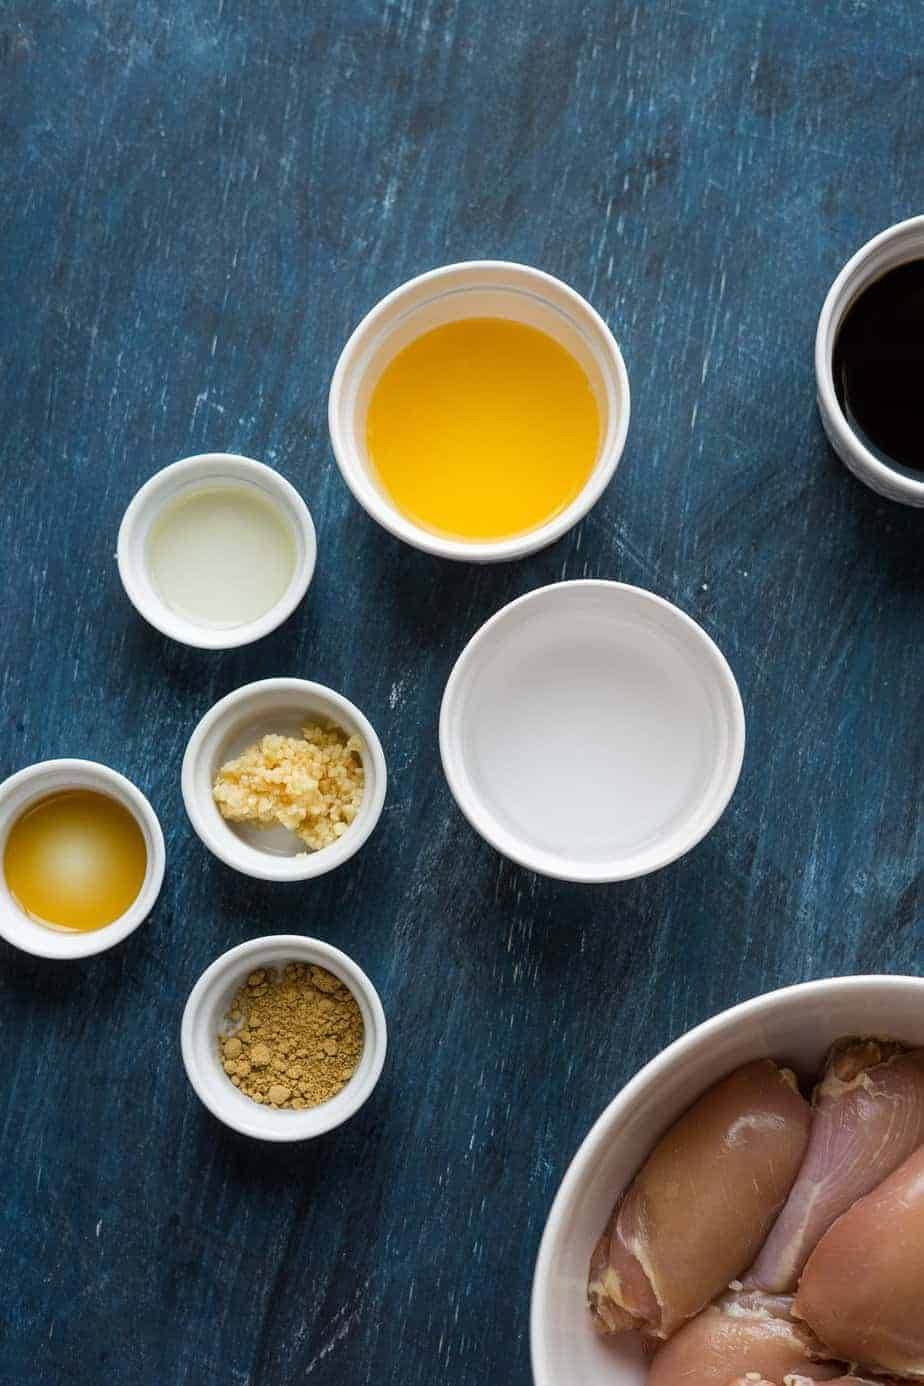 simple ingredients measured in small bowls